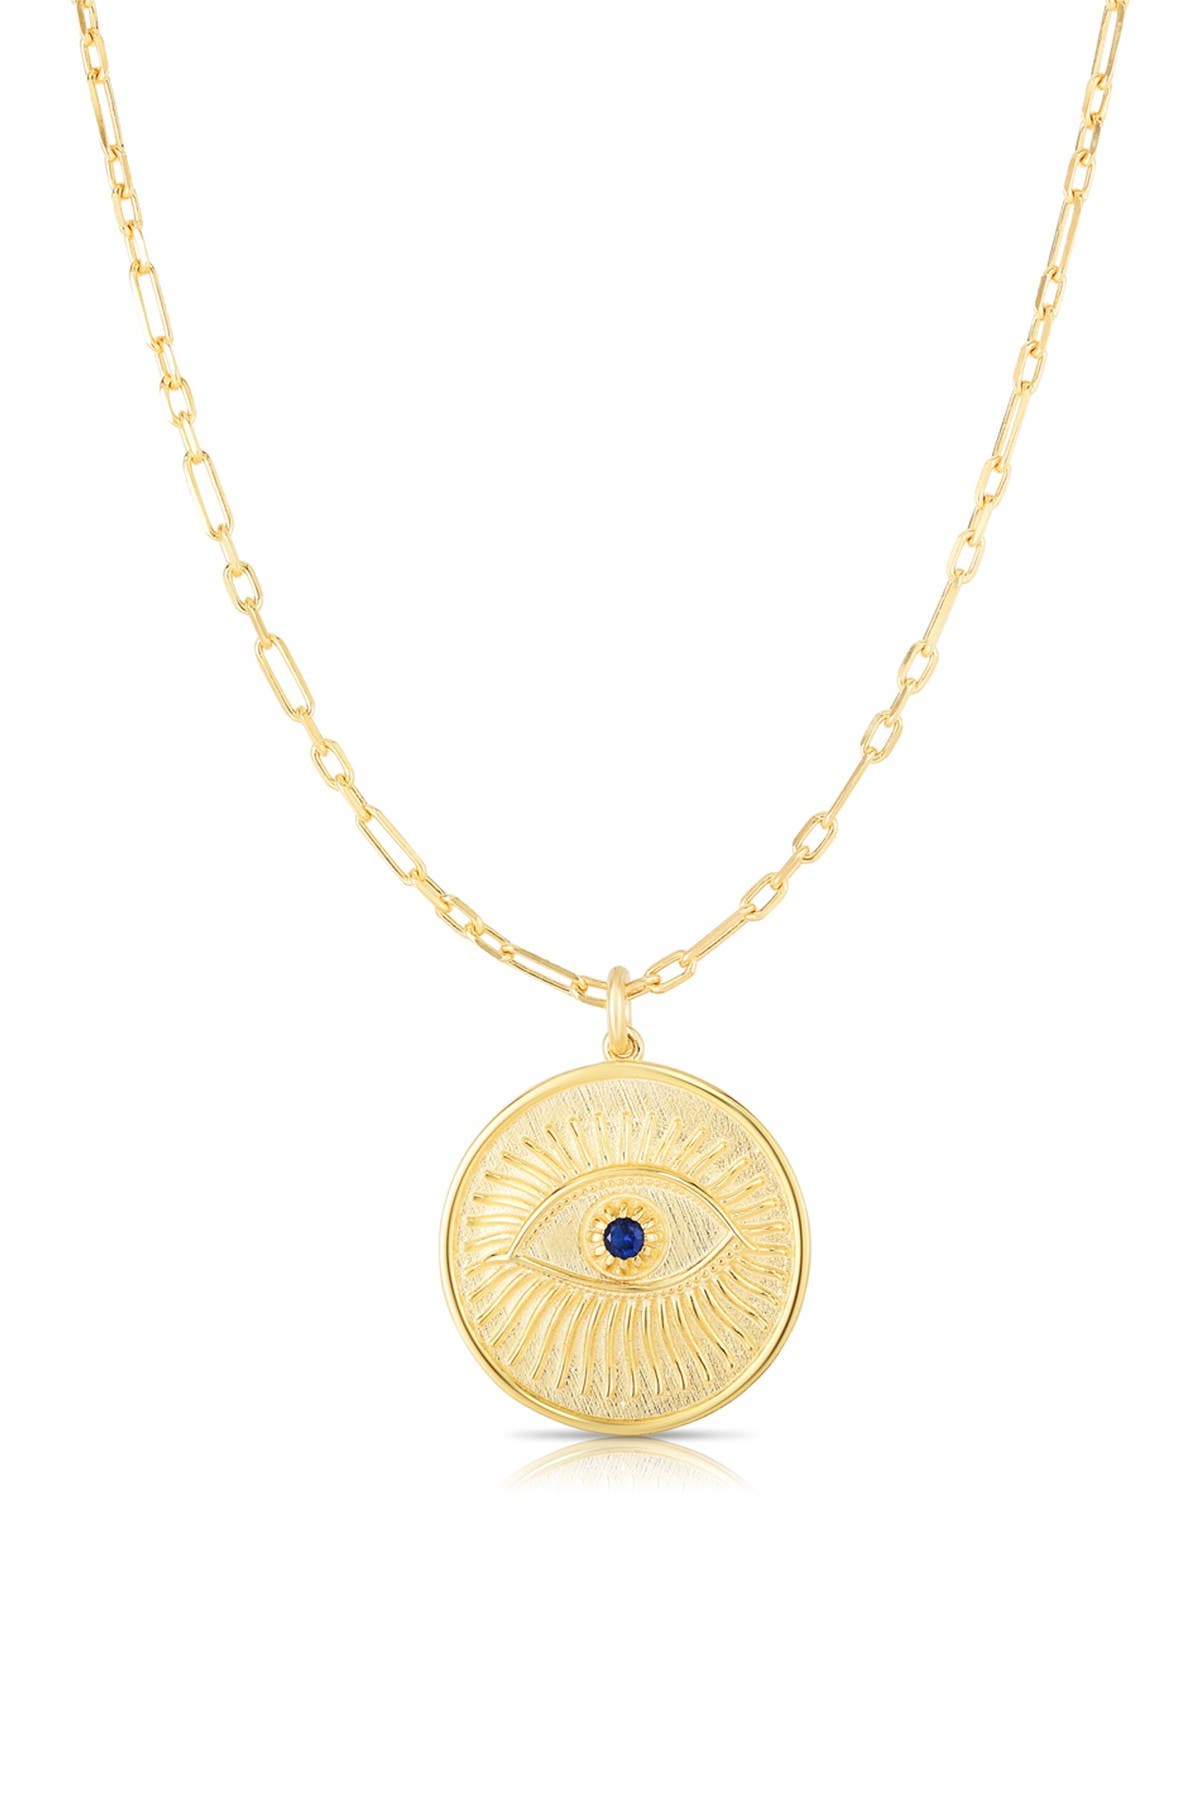 Image of Sphera Milano 14K Gold Vermeil CZ Evil Eye Medallion Pendant Necklace